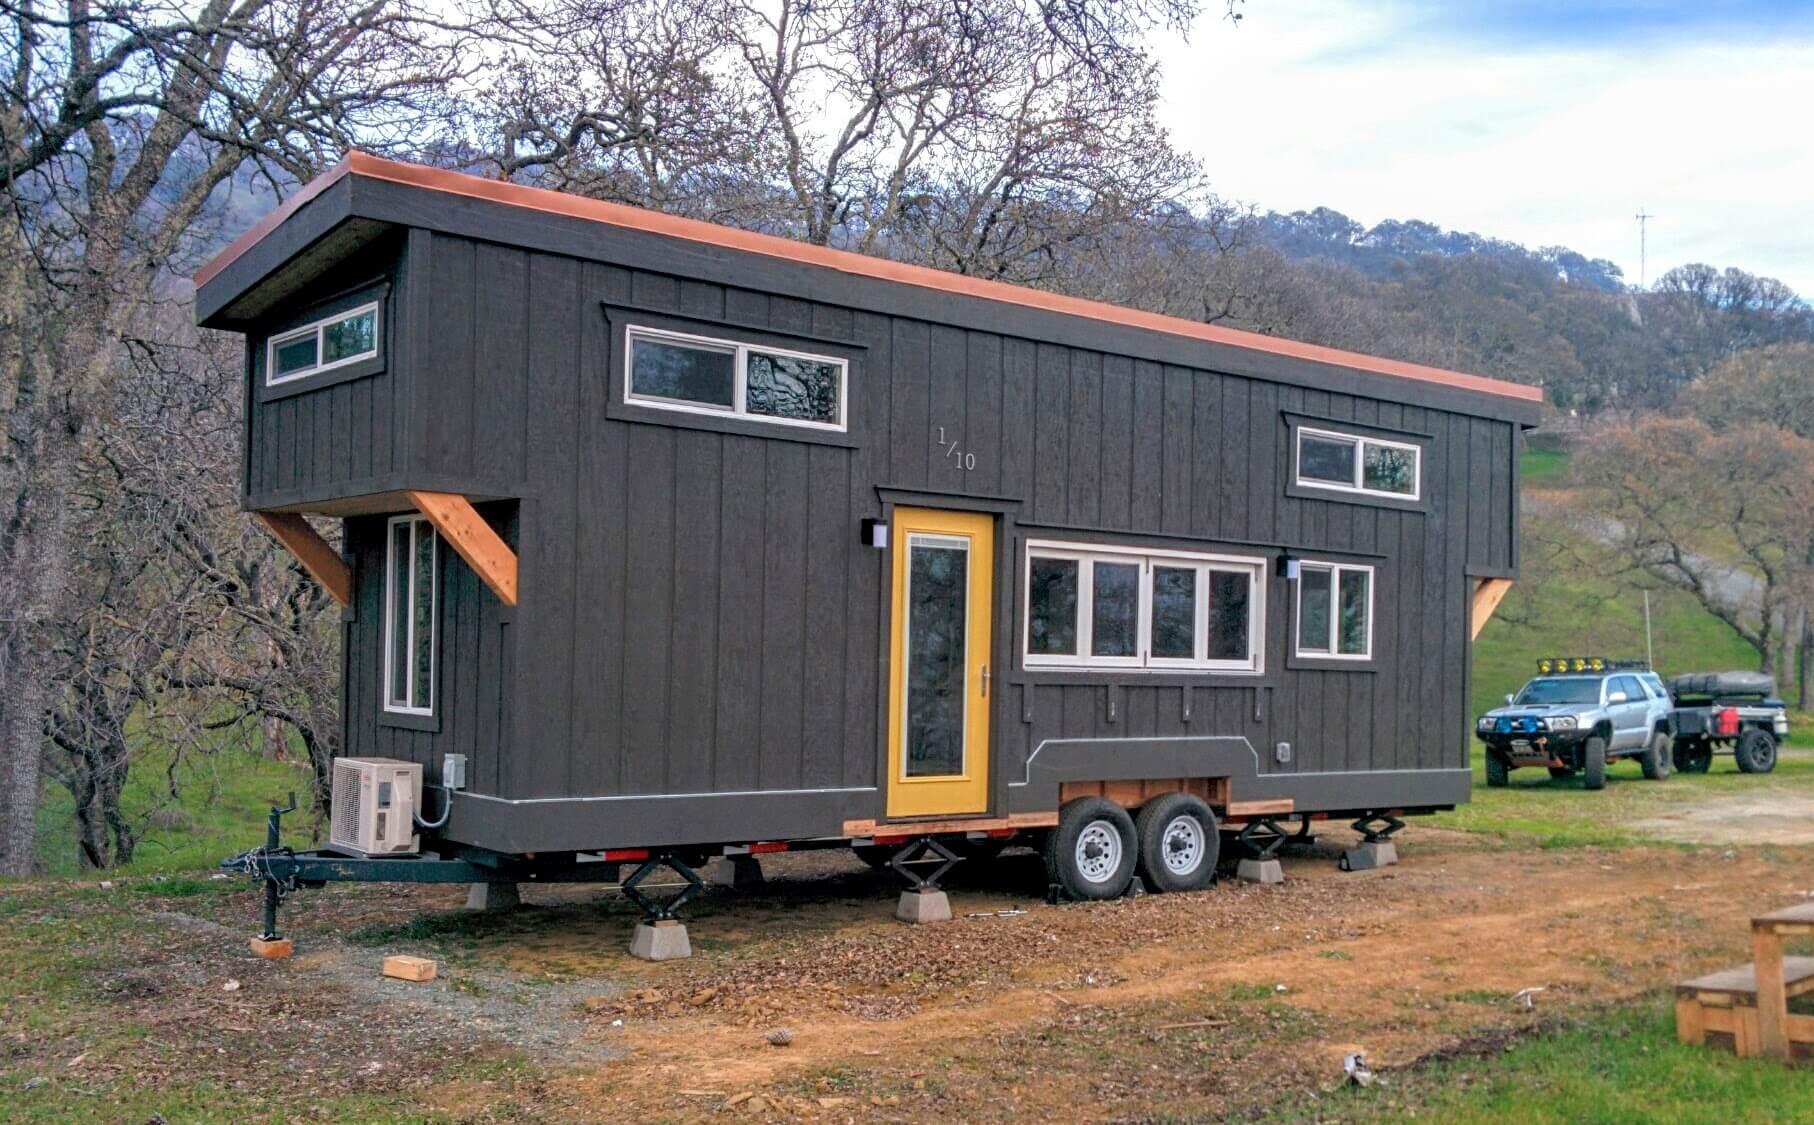 Setting Up And Leveling Out Tiny House Basics